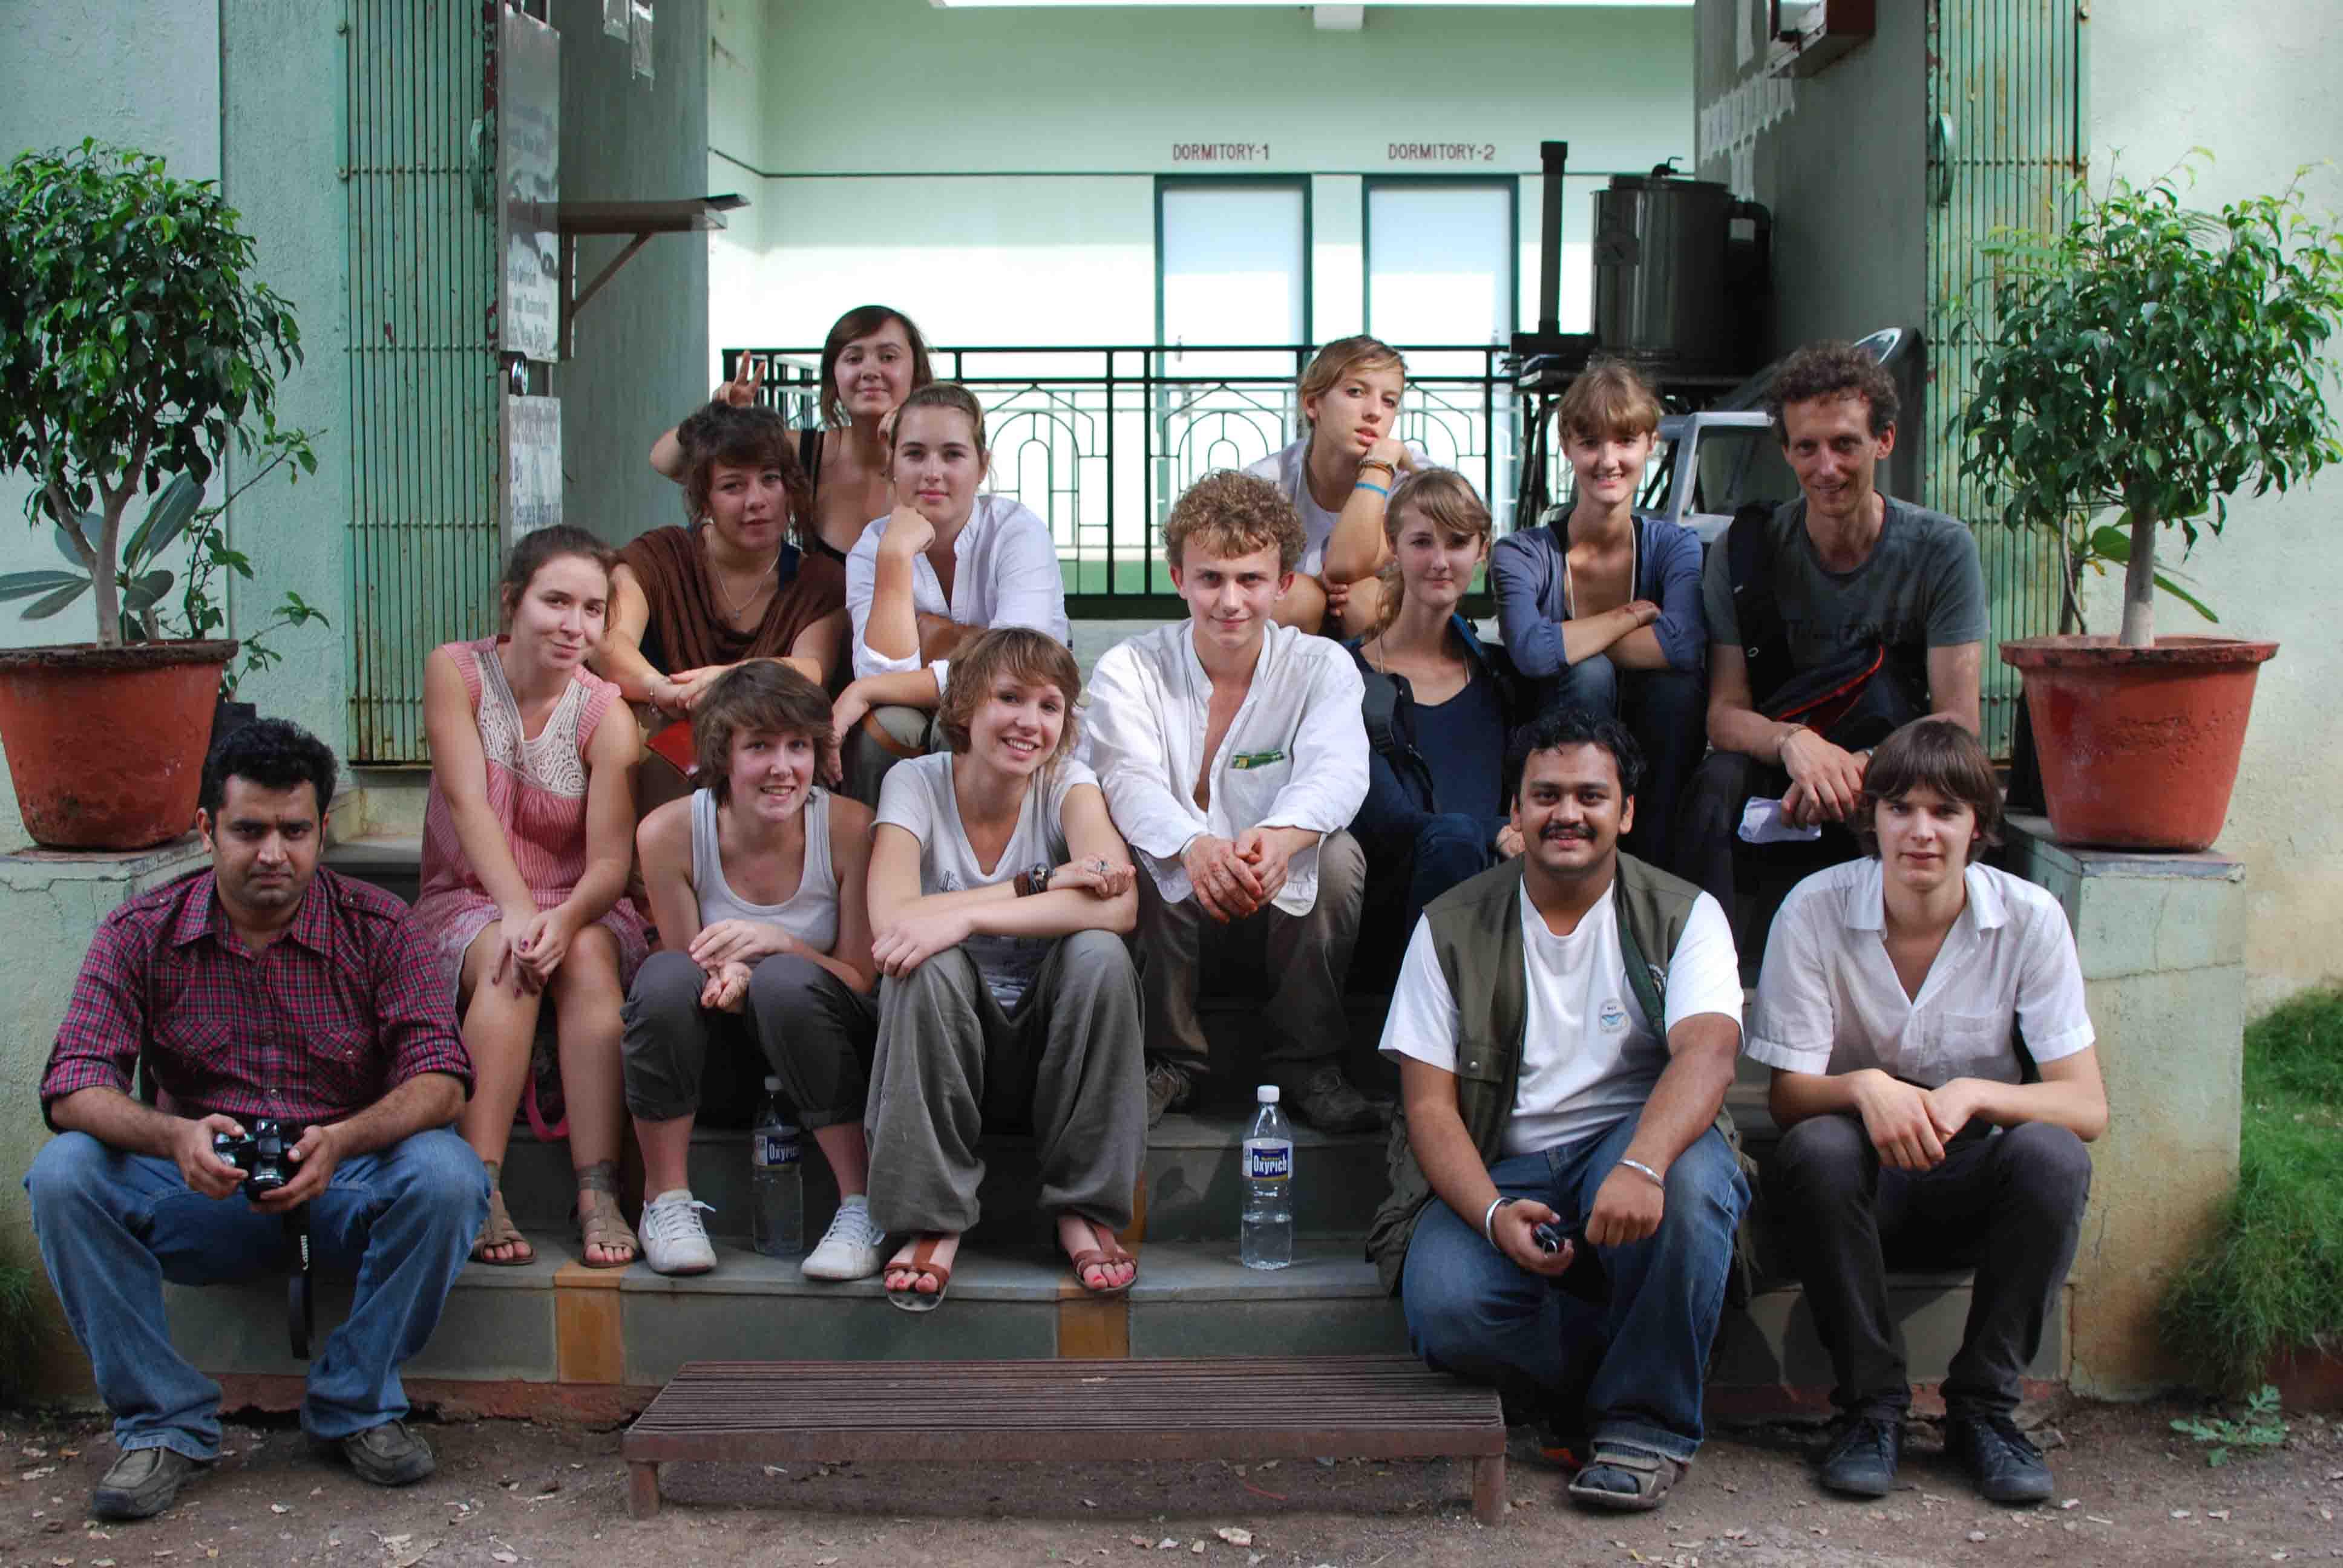 Groupe lycéens le verrier saint-Lô Phaltan inde arti trekdi team anand karve